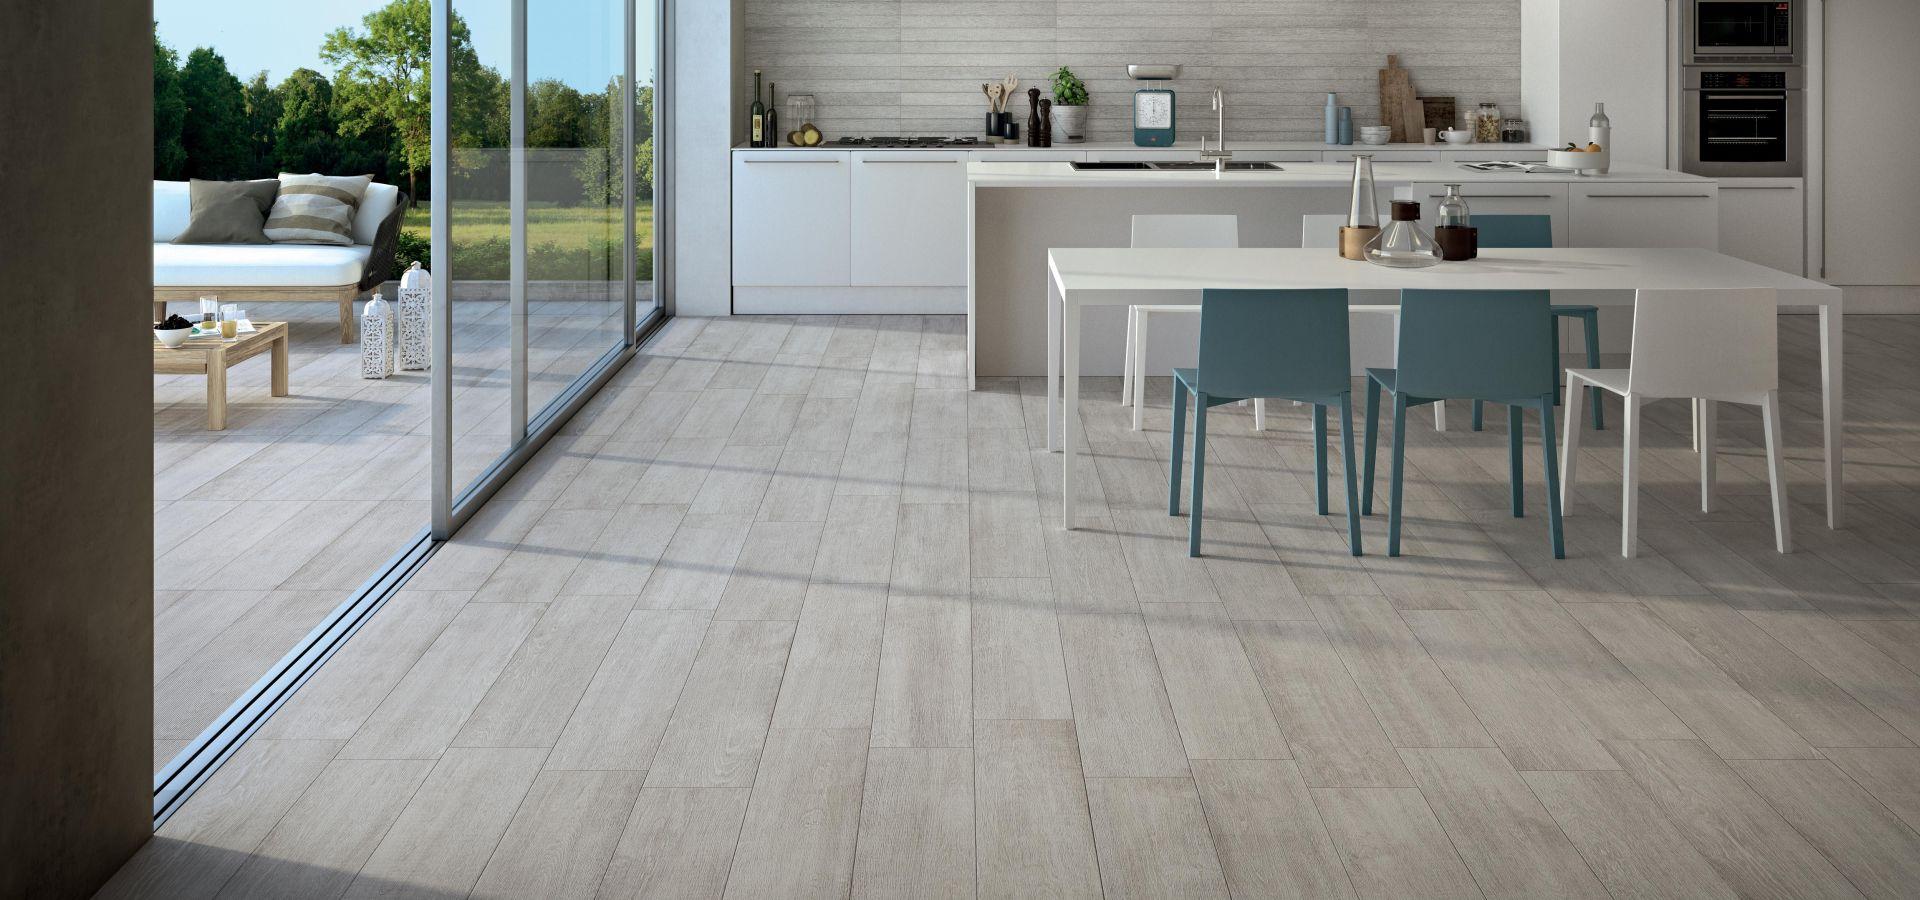 WOOD SELECTION Piemme Floor More - Carrelage e wood